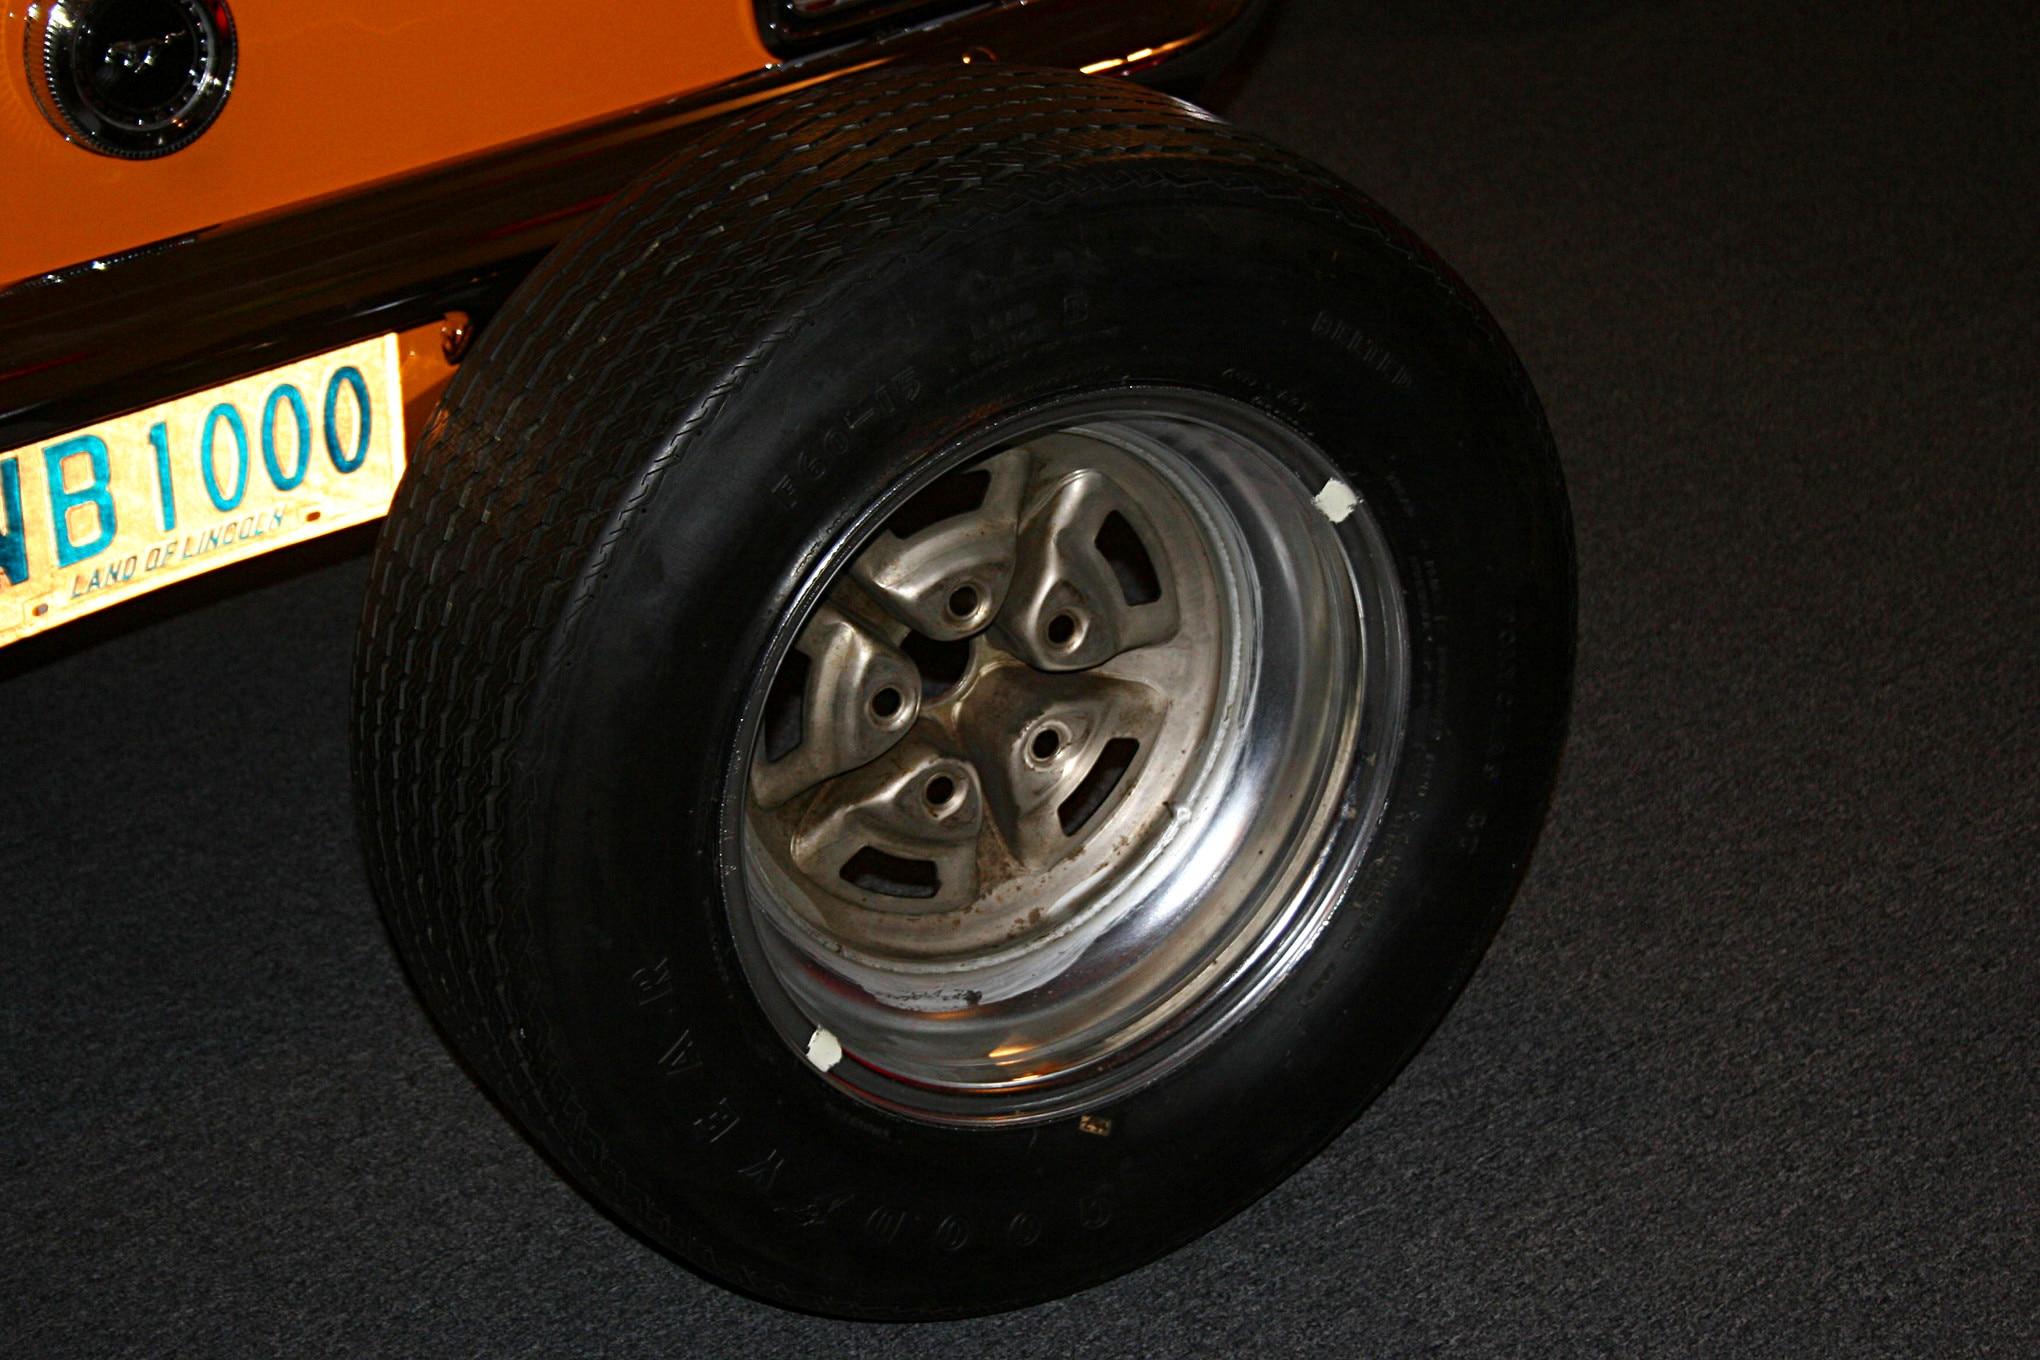 005 Mustang Restoration Technical Questions Wheel Paint Daub